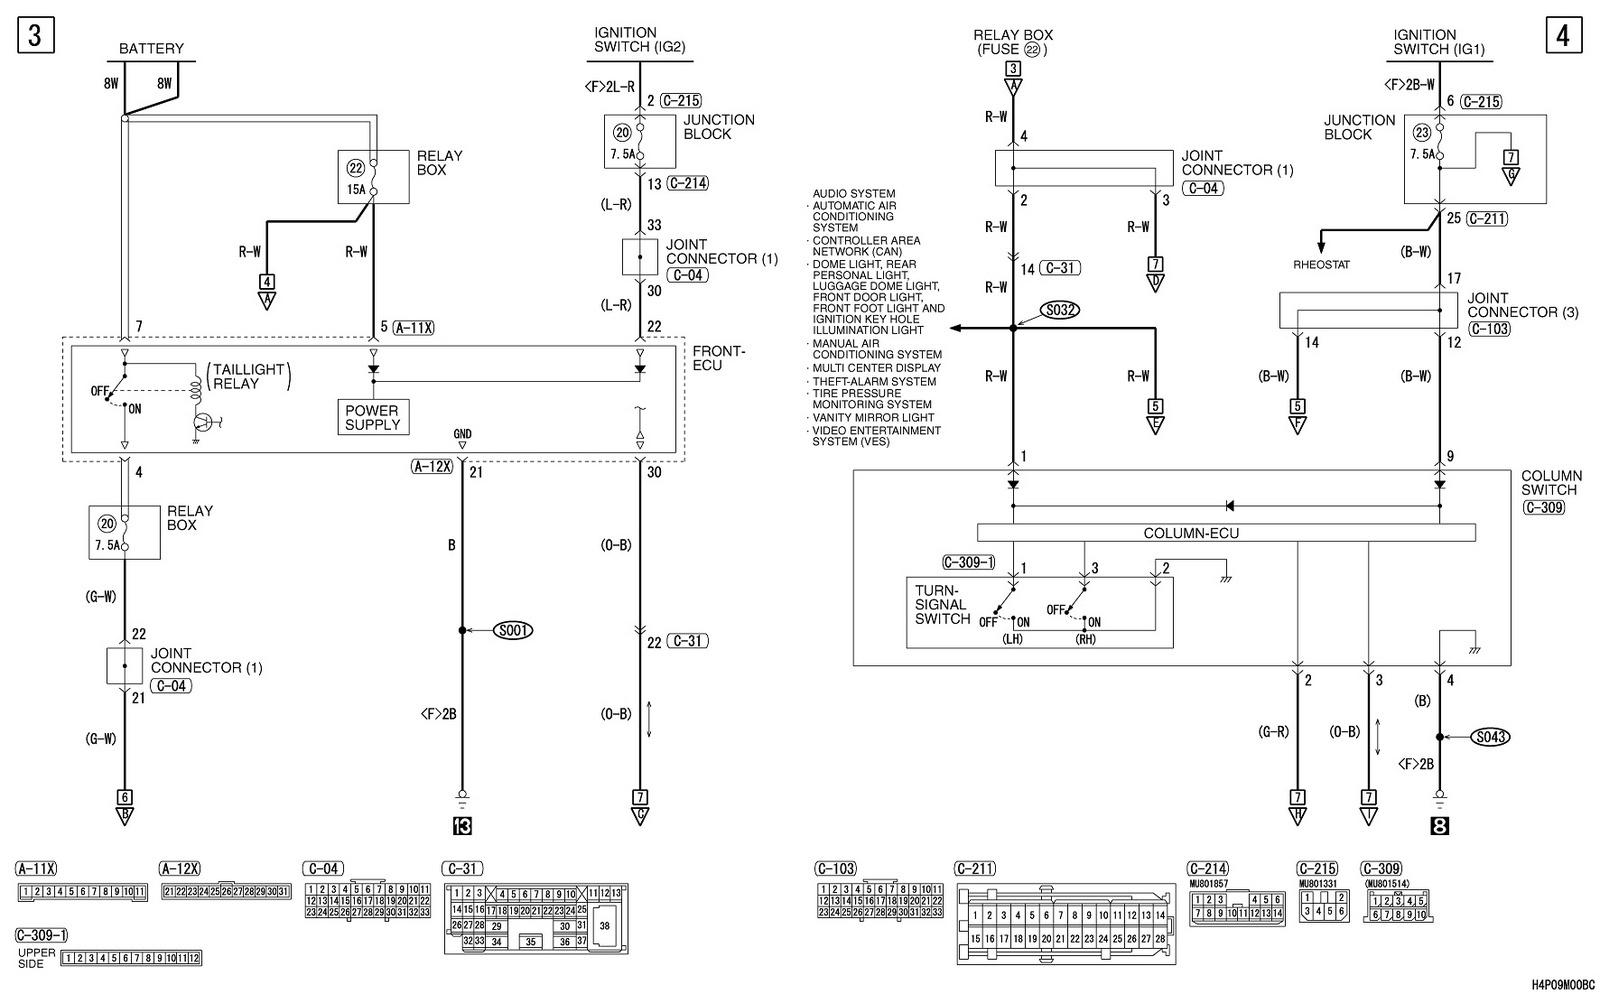 2001 Mitsubishi Eclipse Fuse Box Diagram | laness.us